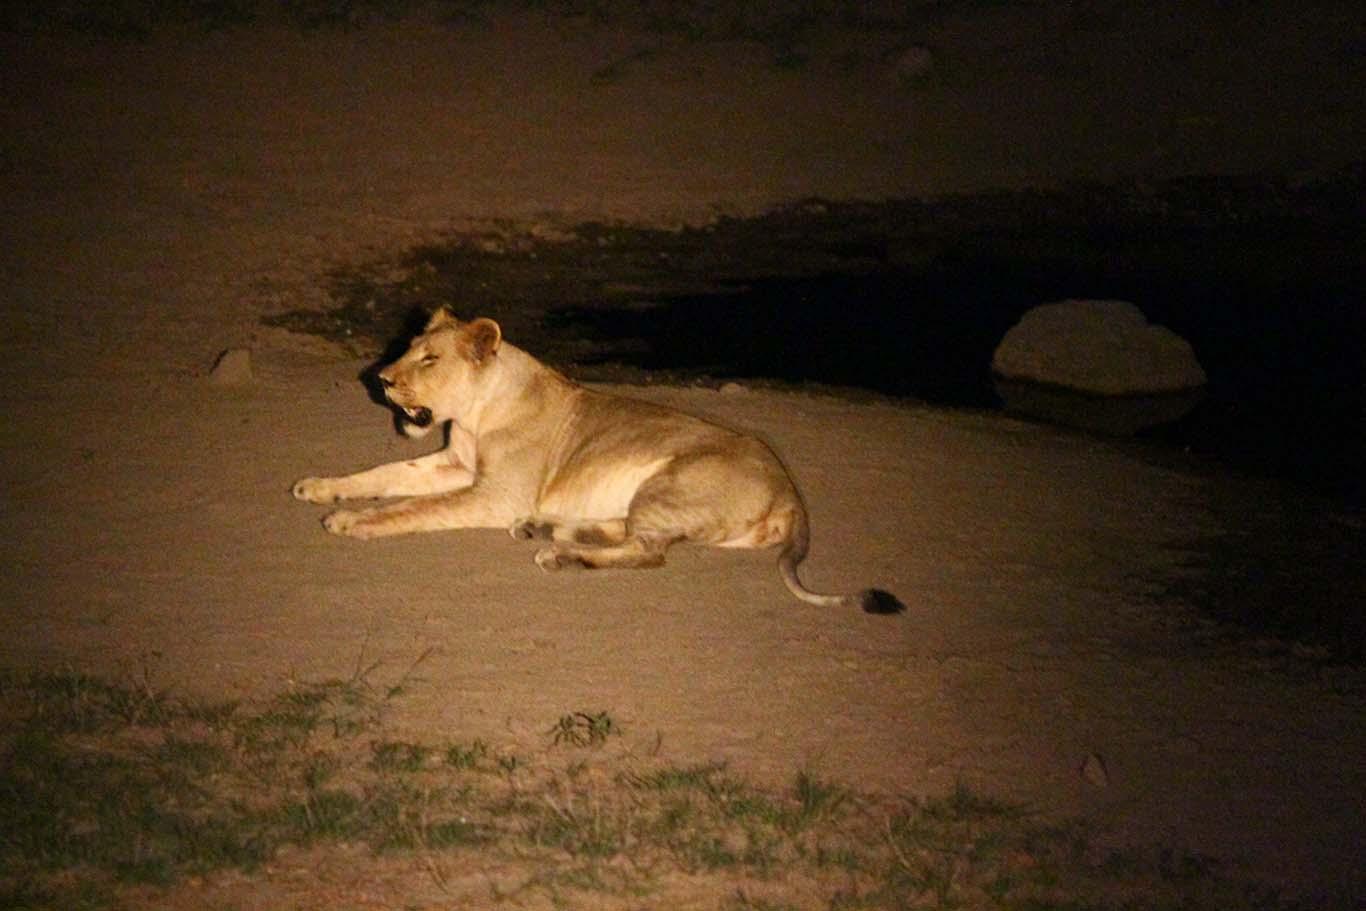 lioness on the night safari